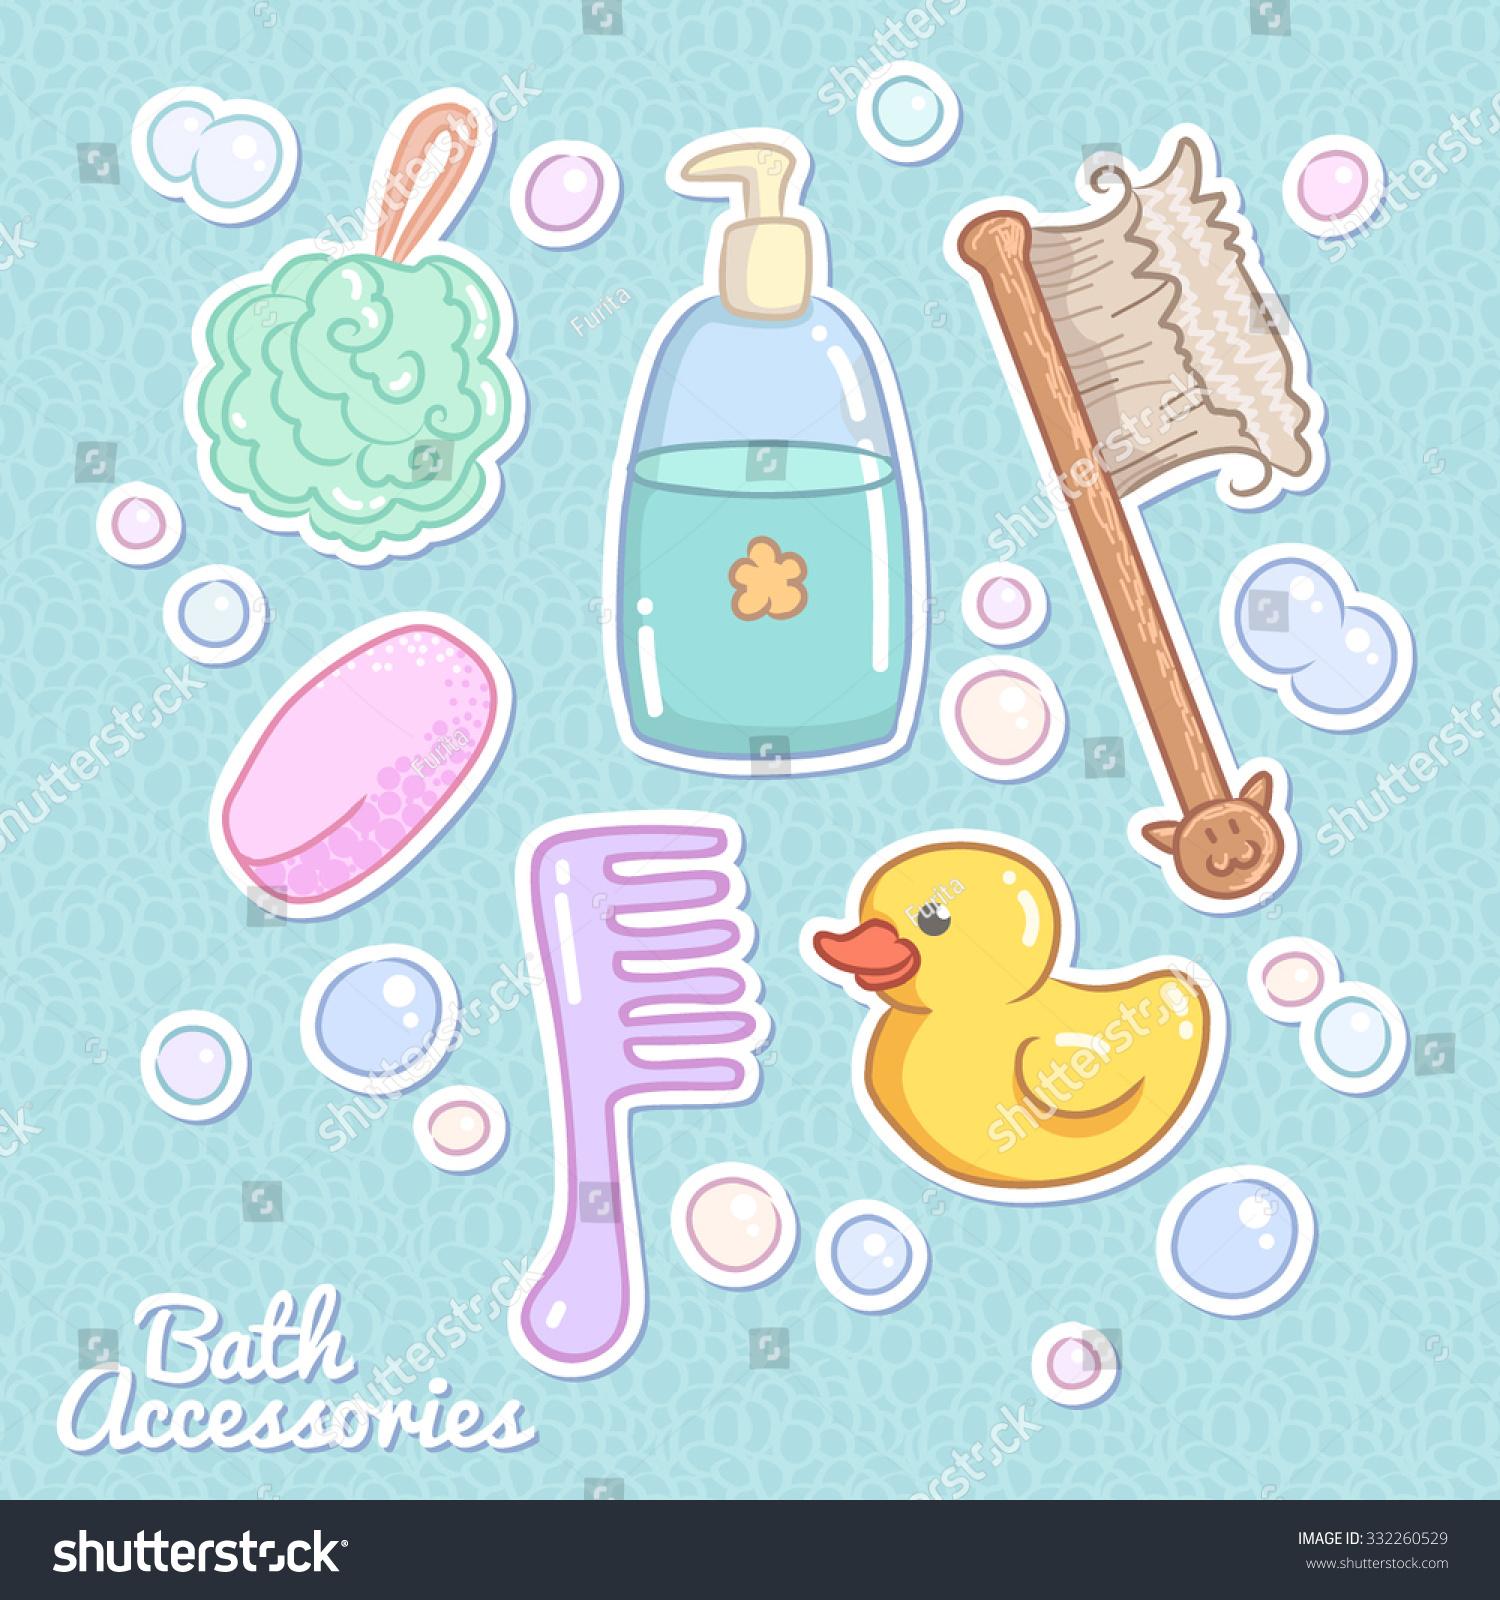 Rubber ducky bathroom accessories - Bath Accessories Shampoo Soap Wisp Of Bast Bath Brush Comb